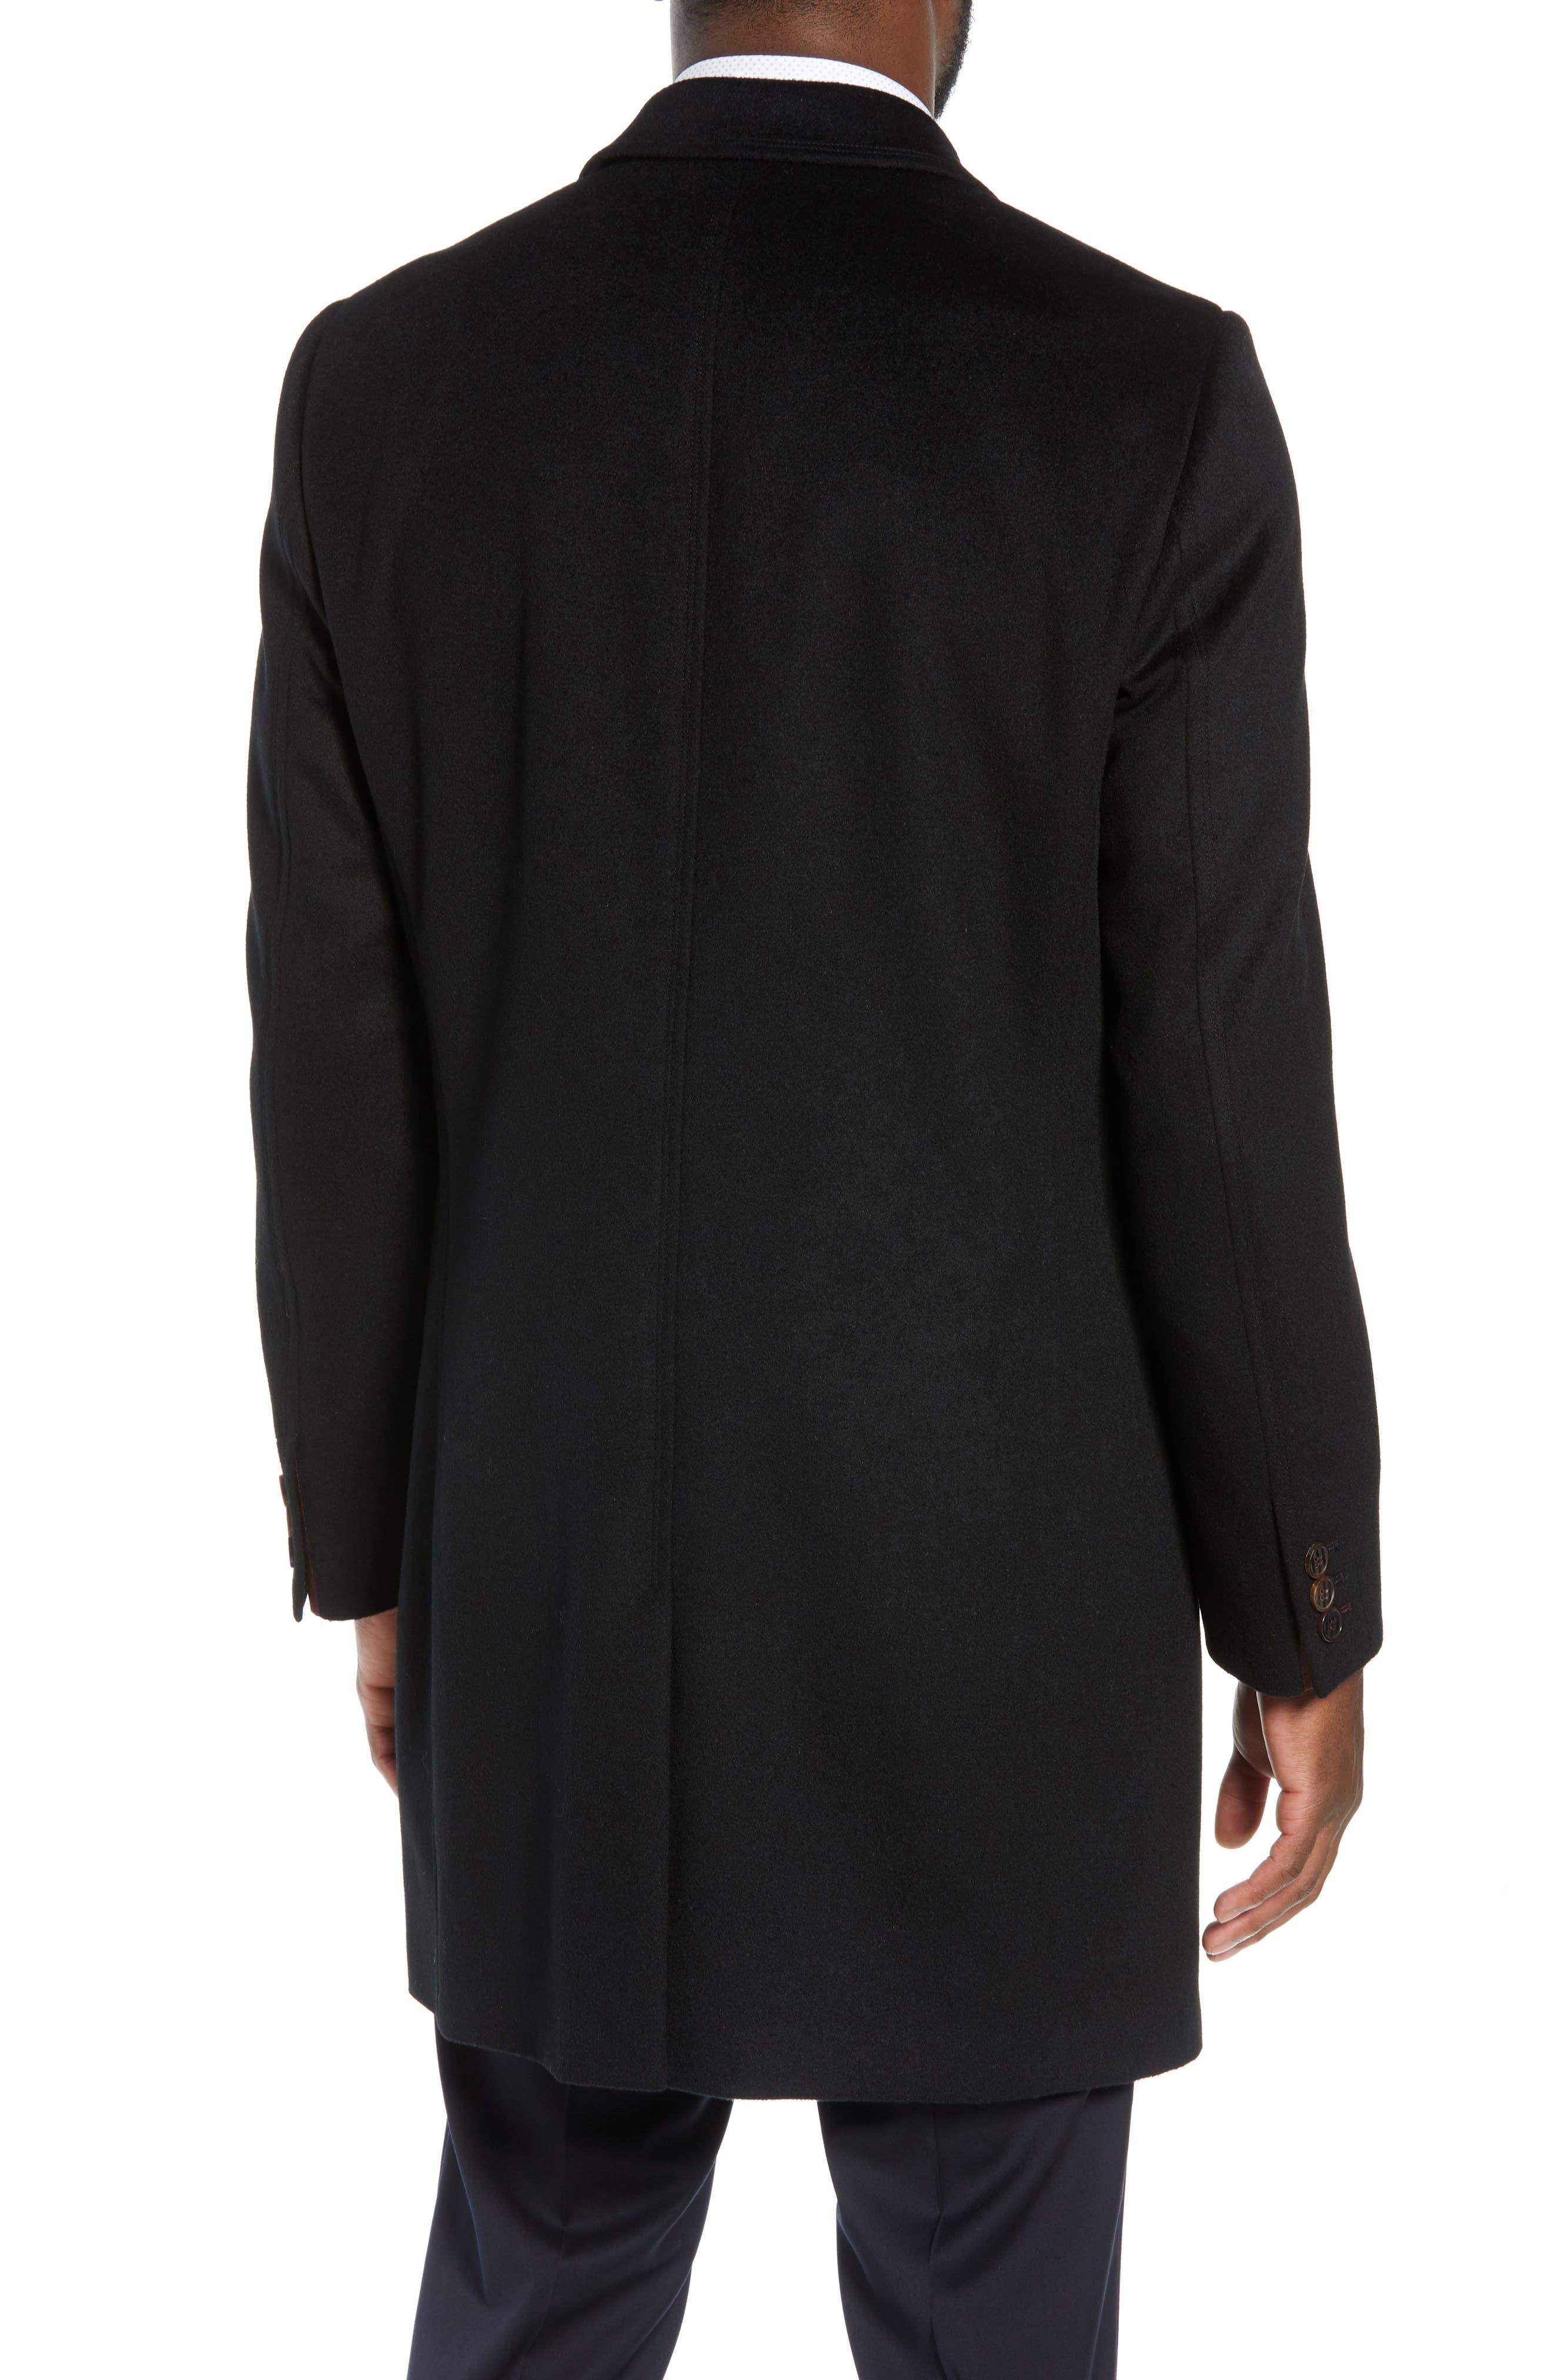 Swish Wool & Cashmere Overcoat,                             Alternate thumbnail 2, color,                             001